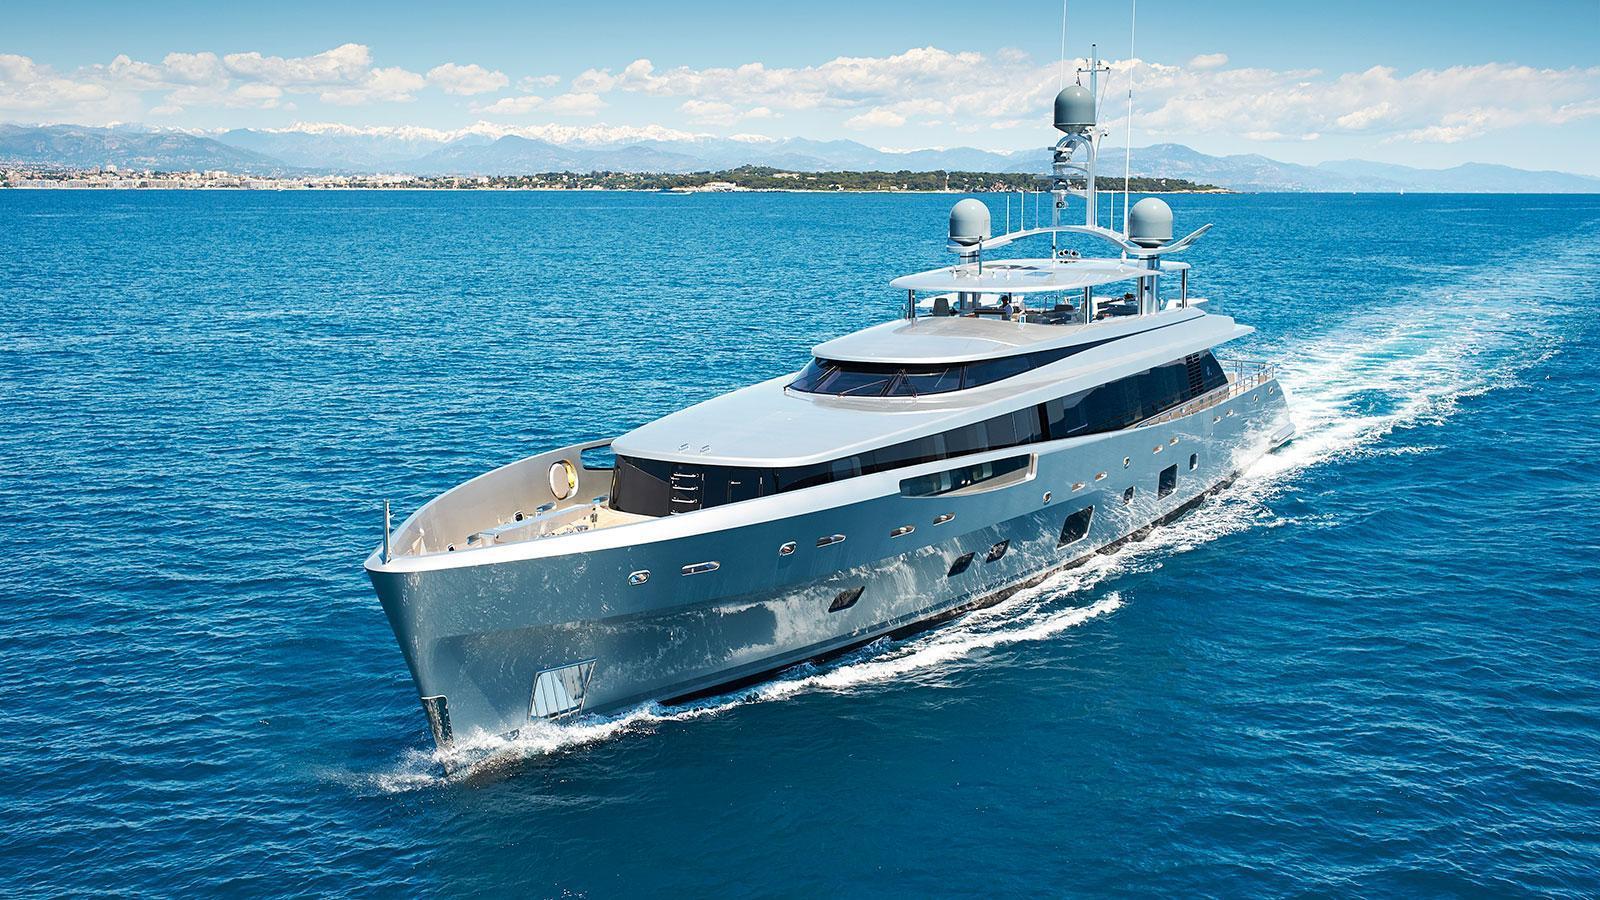 lady-may-motor-yacht-feadship-46m-2014-cruising-bow